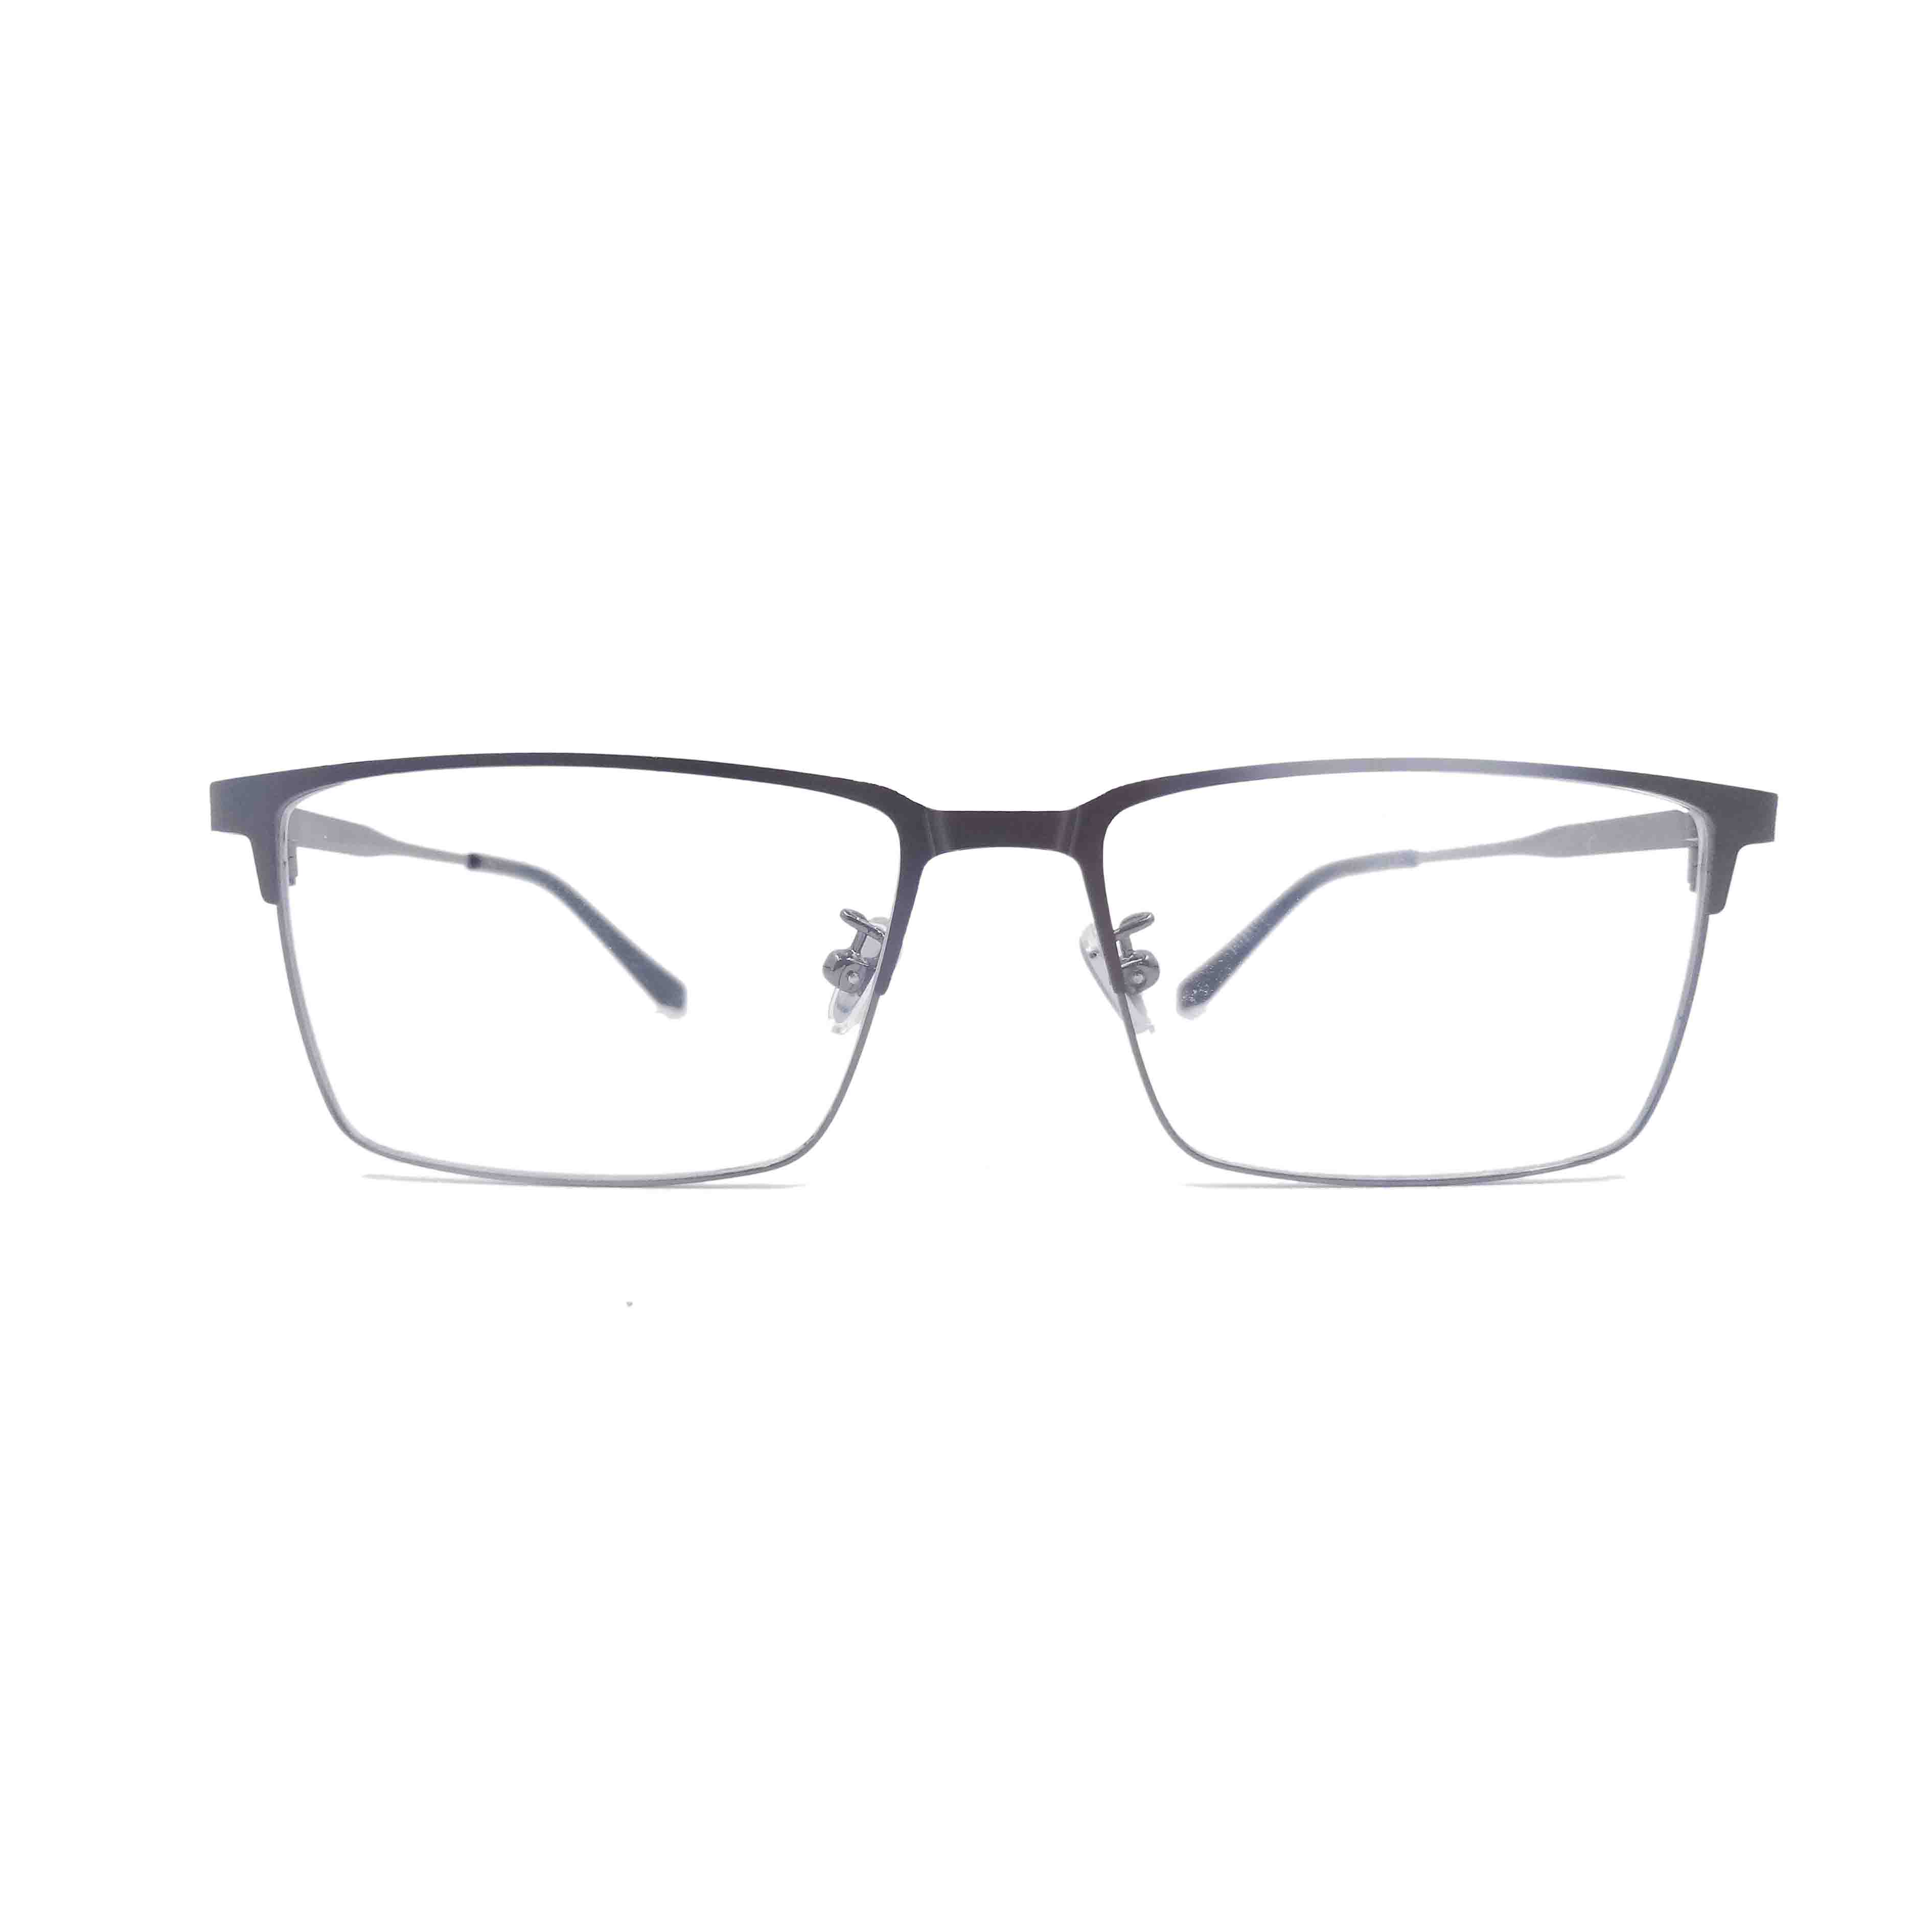 4748ebae77 Designer Glasses Frames Eyewear